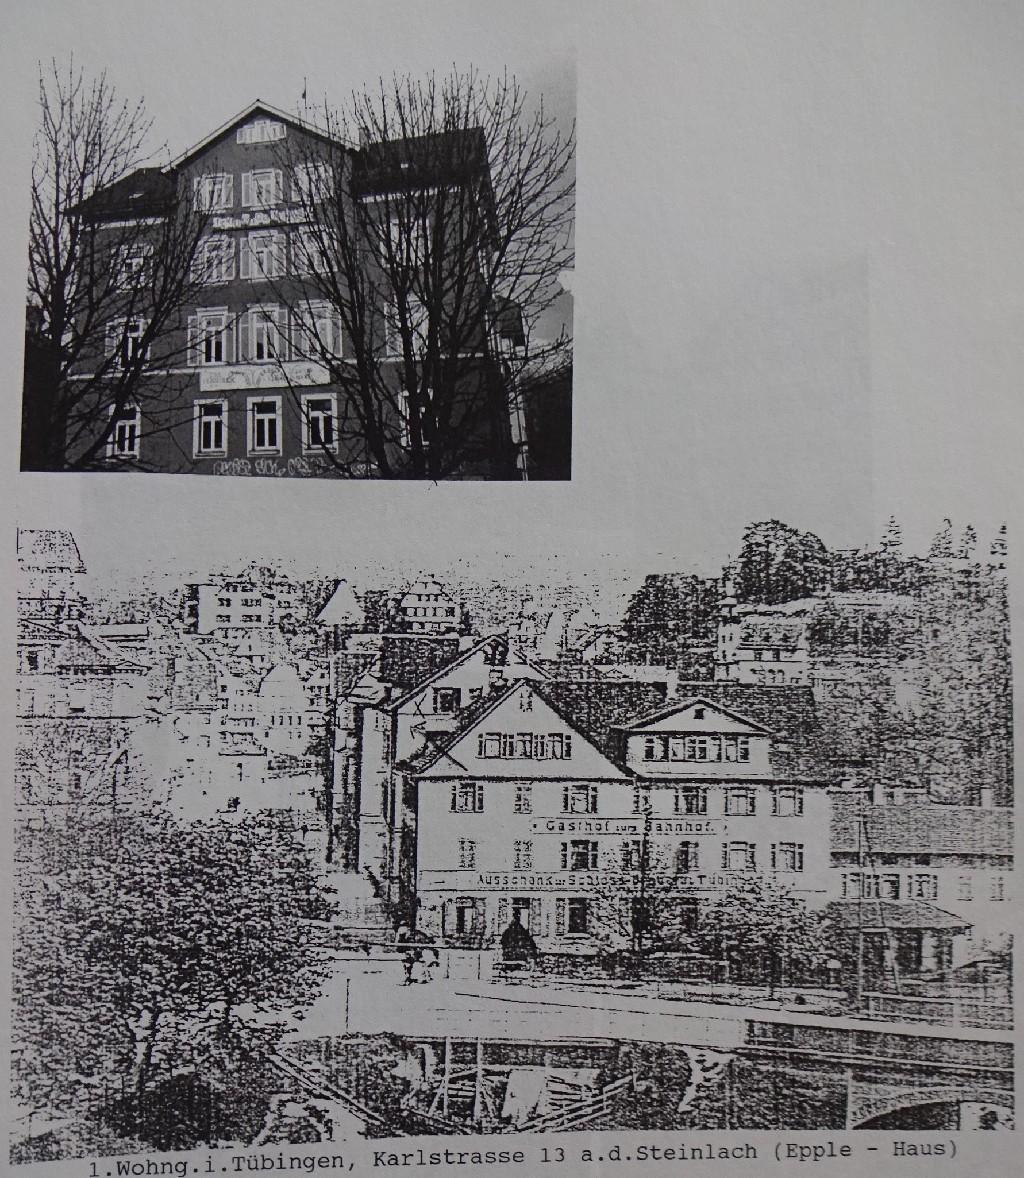 Karlstrasse 13 (Epple-Haus)